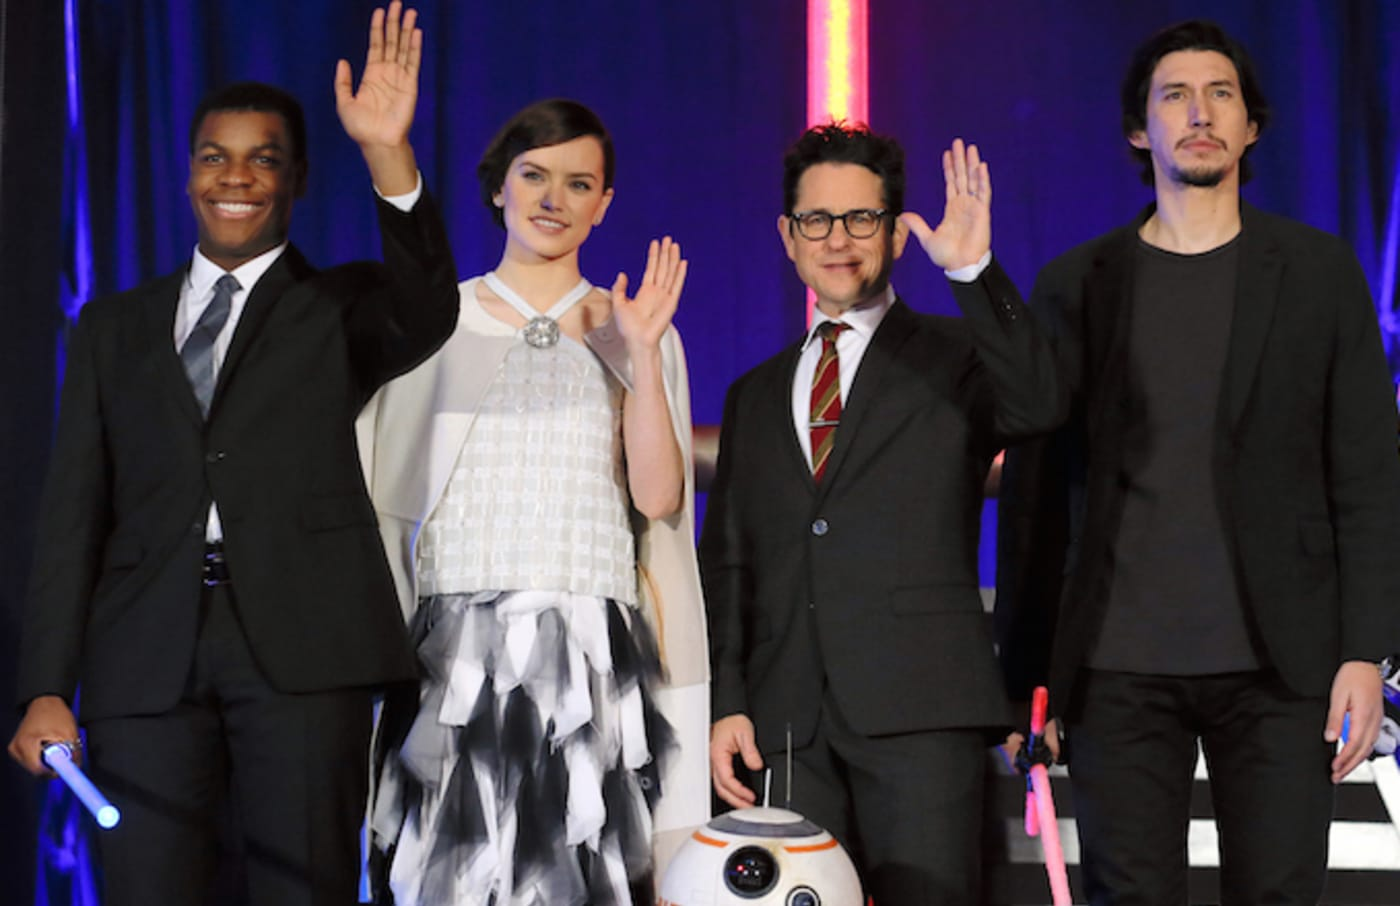 John Boyega and Daisy Ridley to Reunited in Star Wars 9